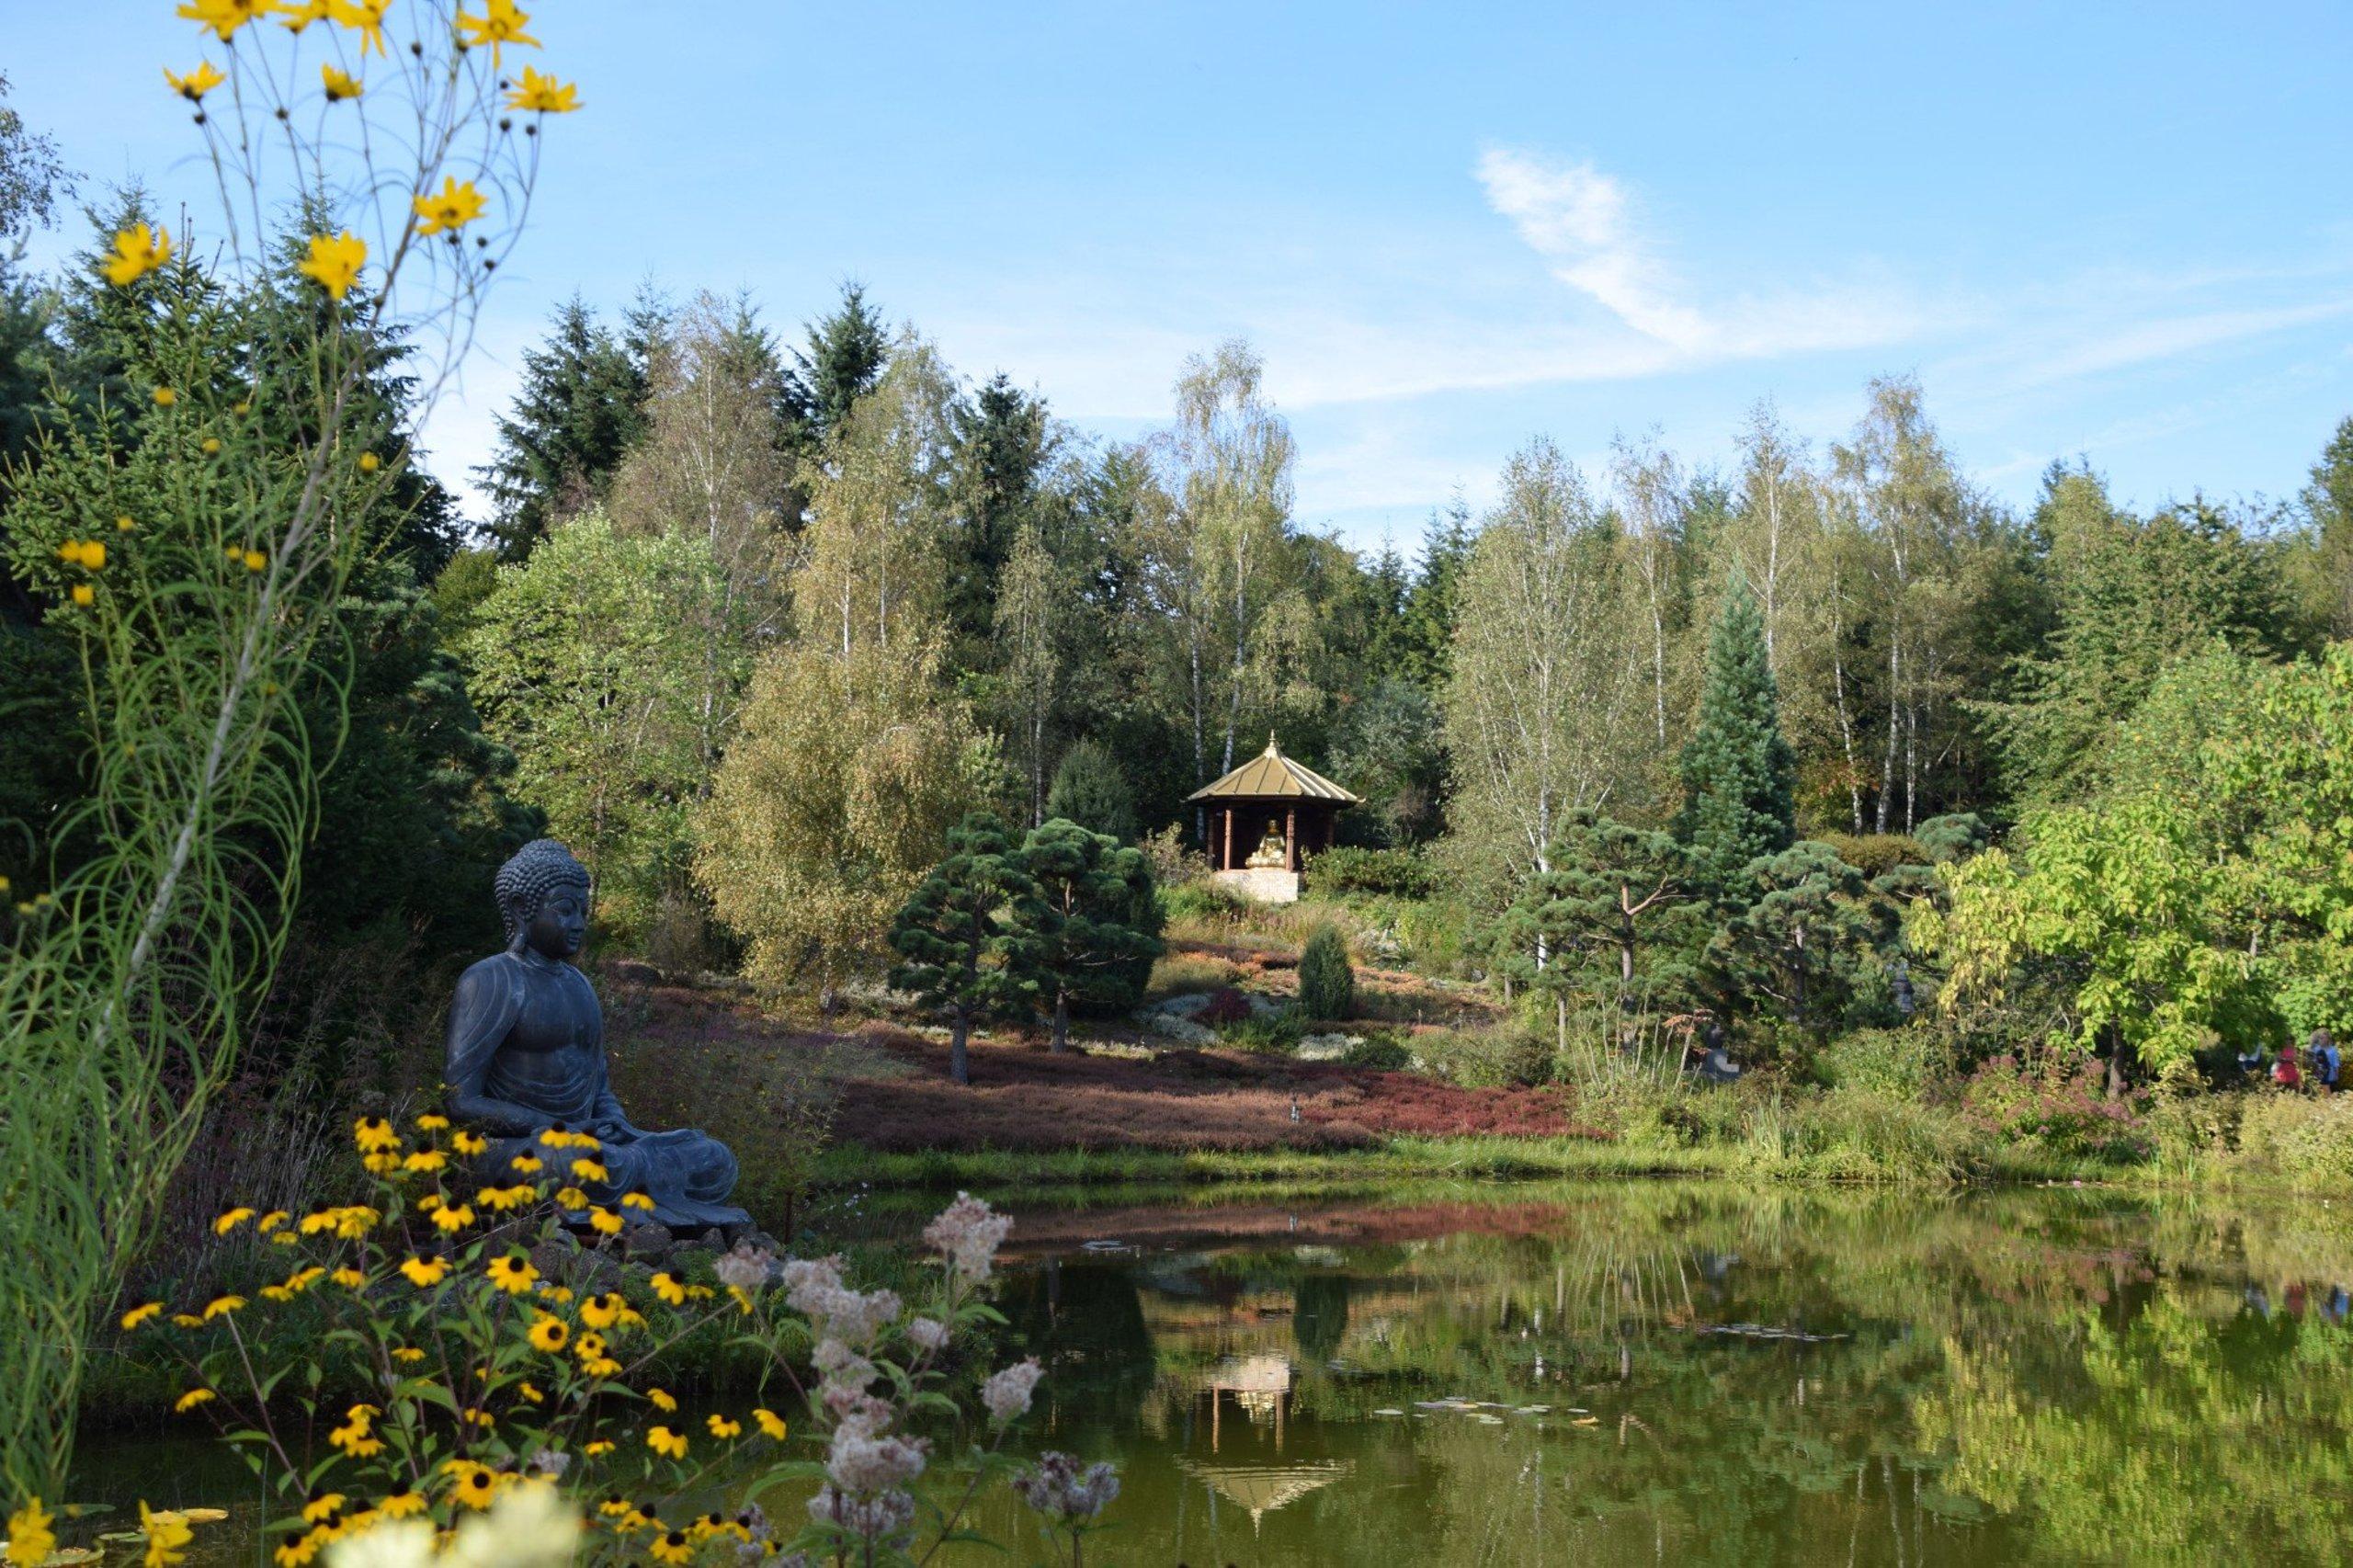 China Garten Best Of Wiesent 2020 Best Of Wiesent Germany tourism Tripadvisor